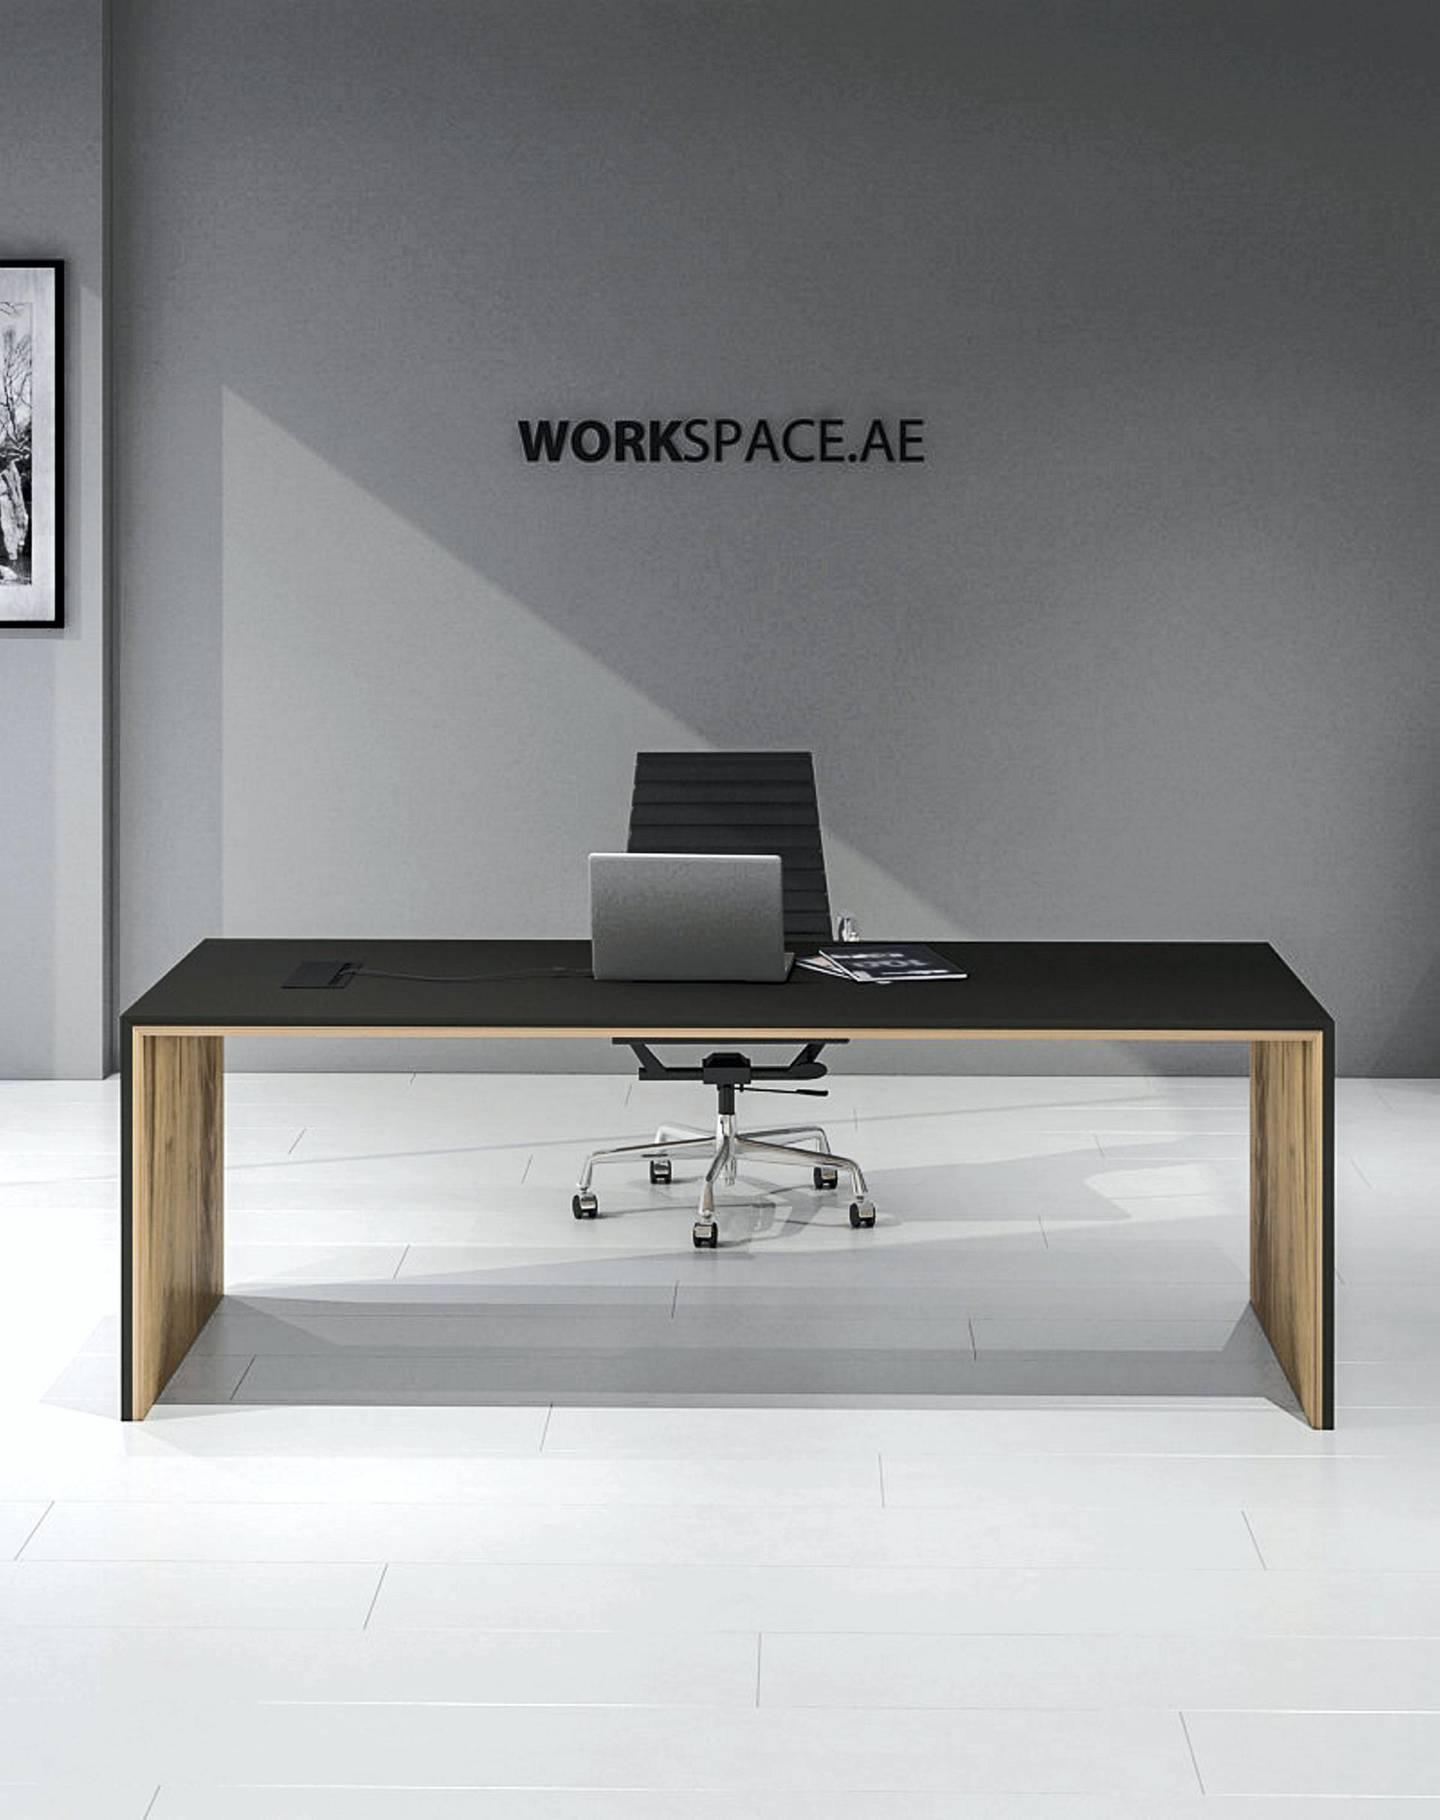 Work space. courtesy: WorkSpace